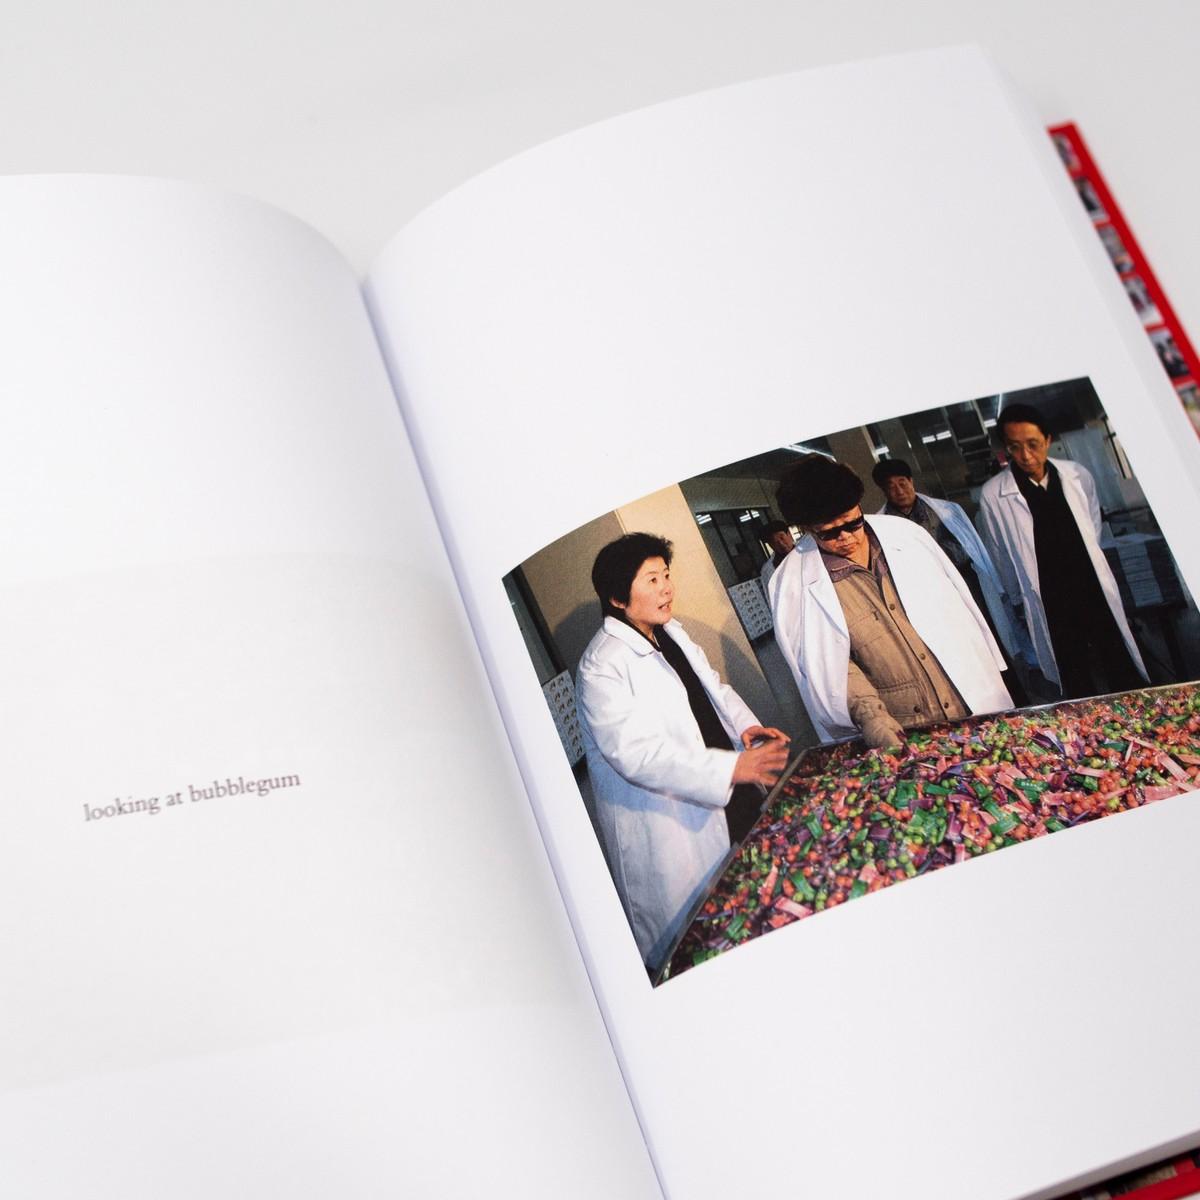 Photo of Kim Jong Il Looking at Things